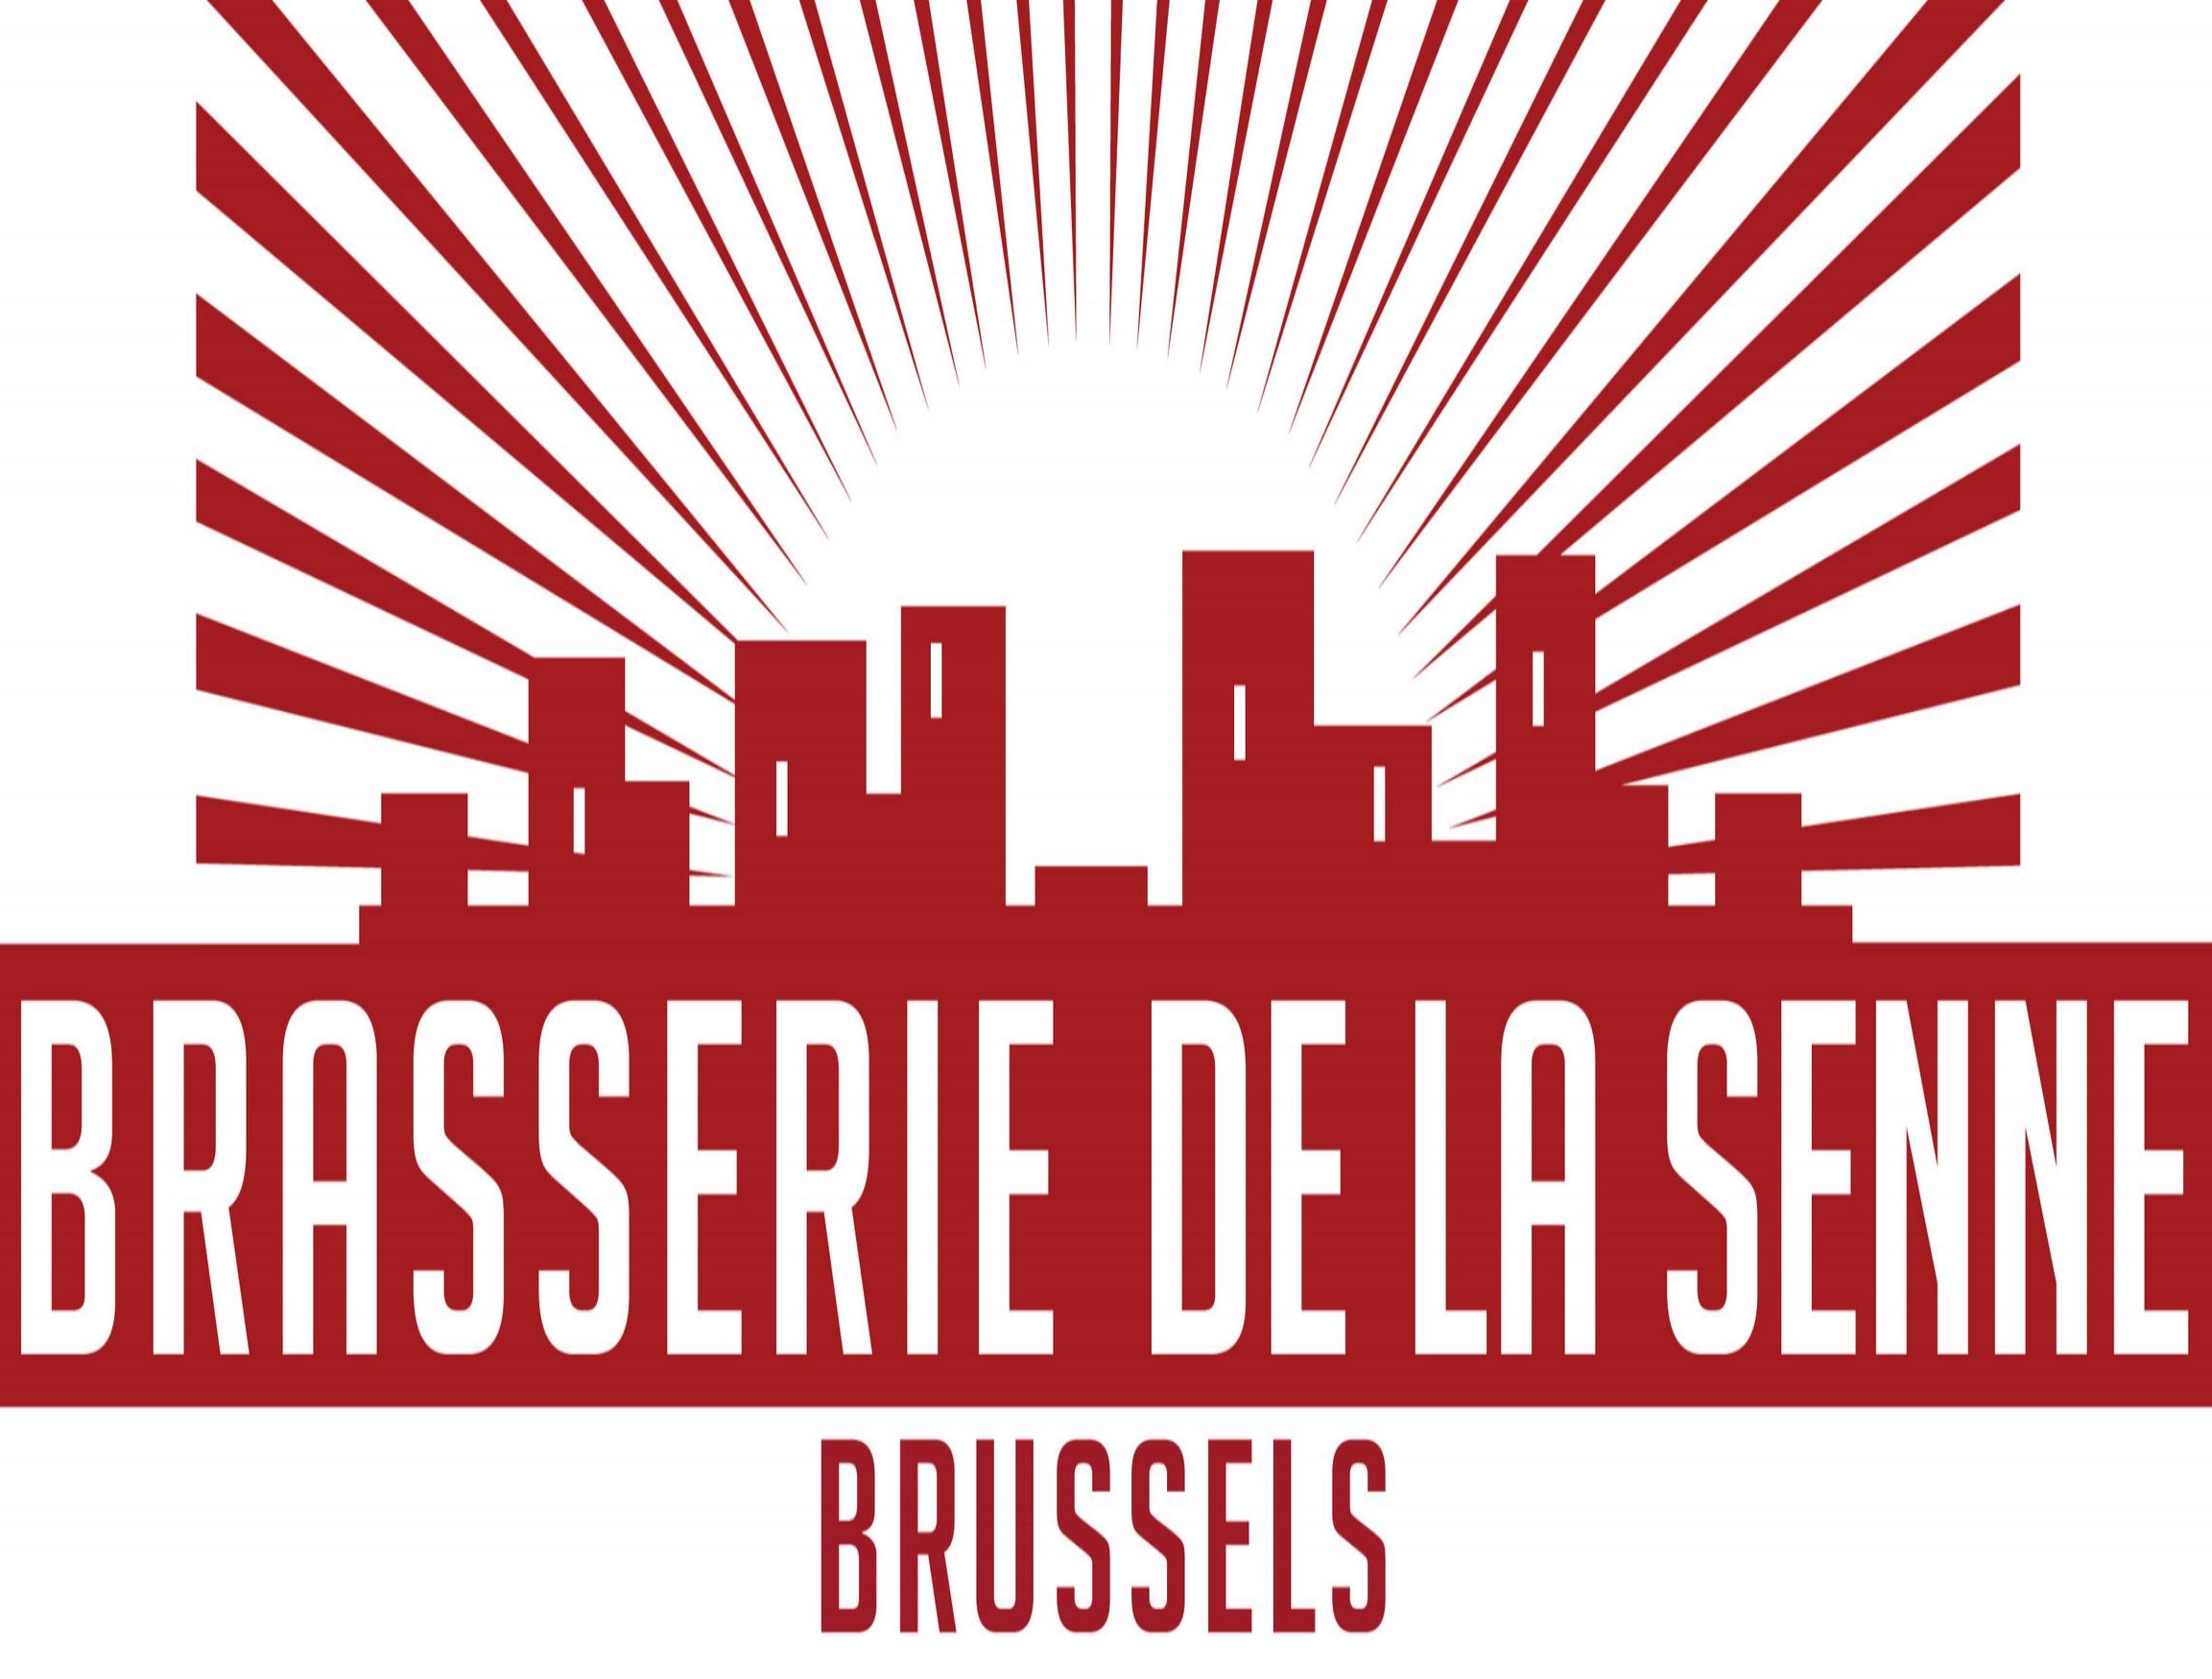 De La Senne, Belgium